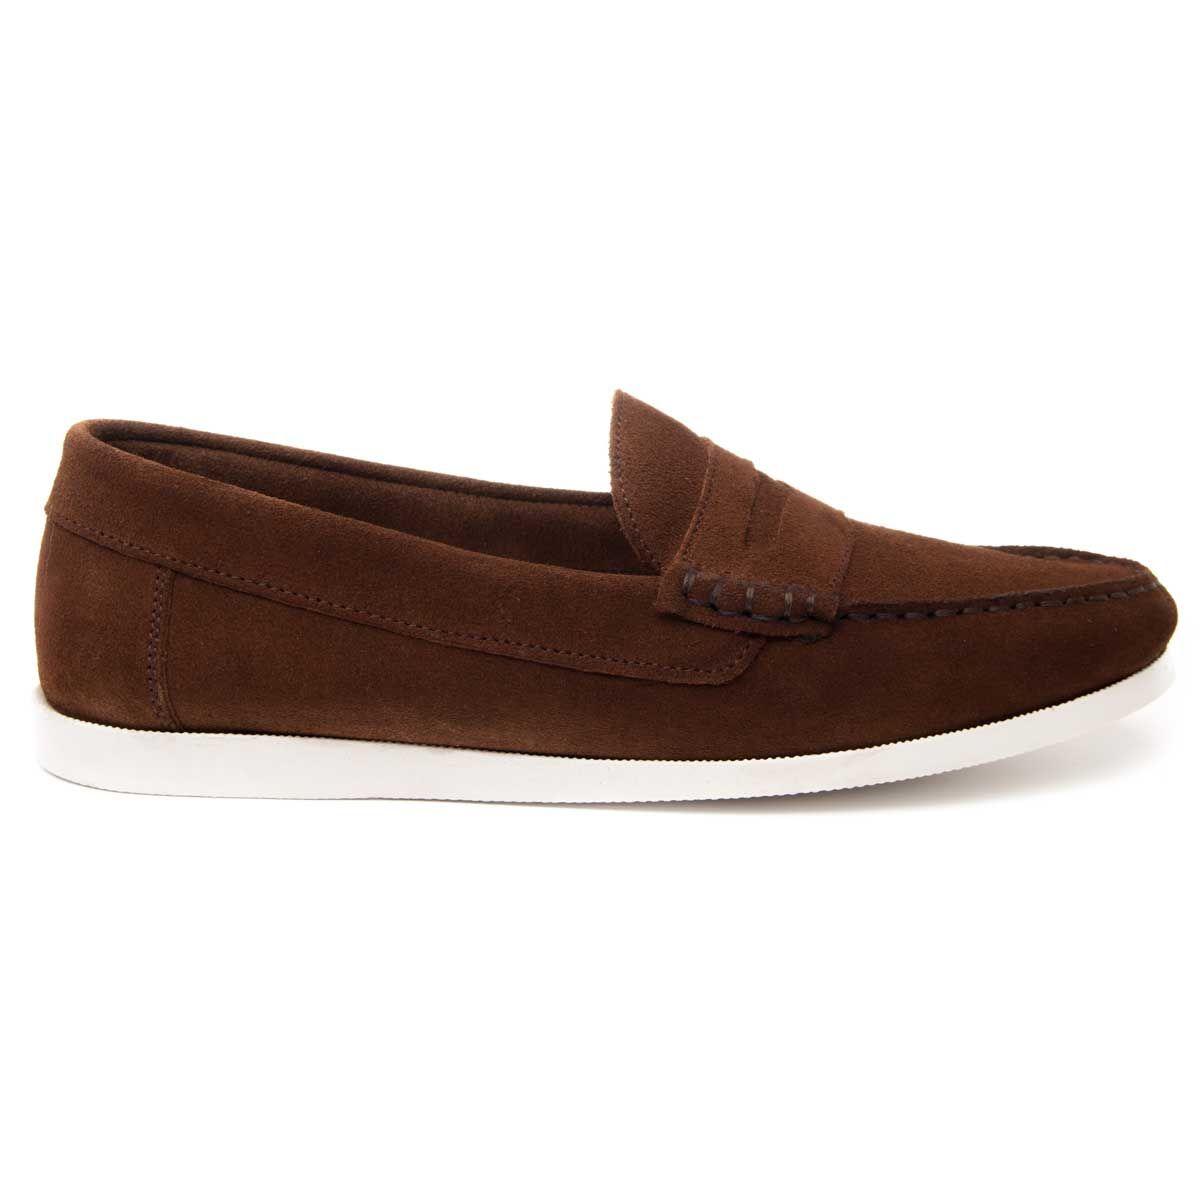 Purapiel Comfortable Moccasin in Brown